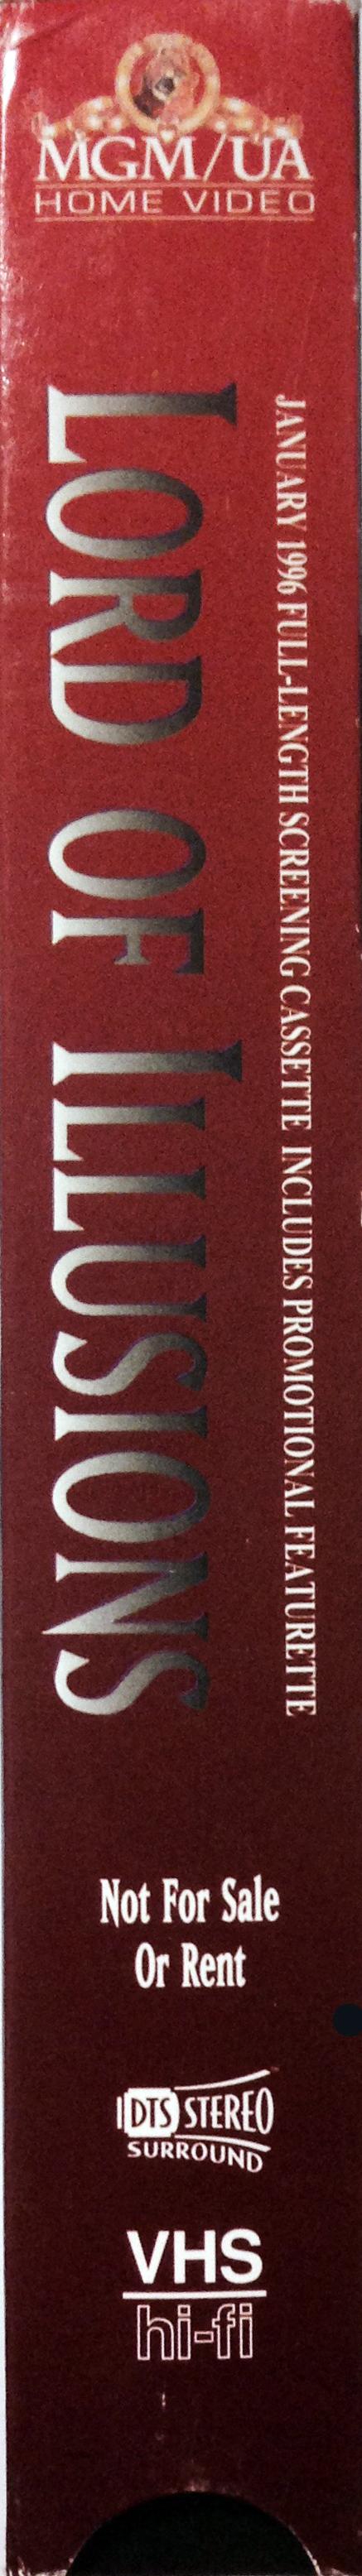 lord of illusions 1995 imdb